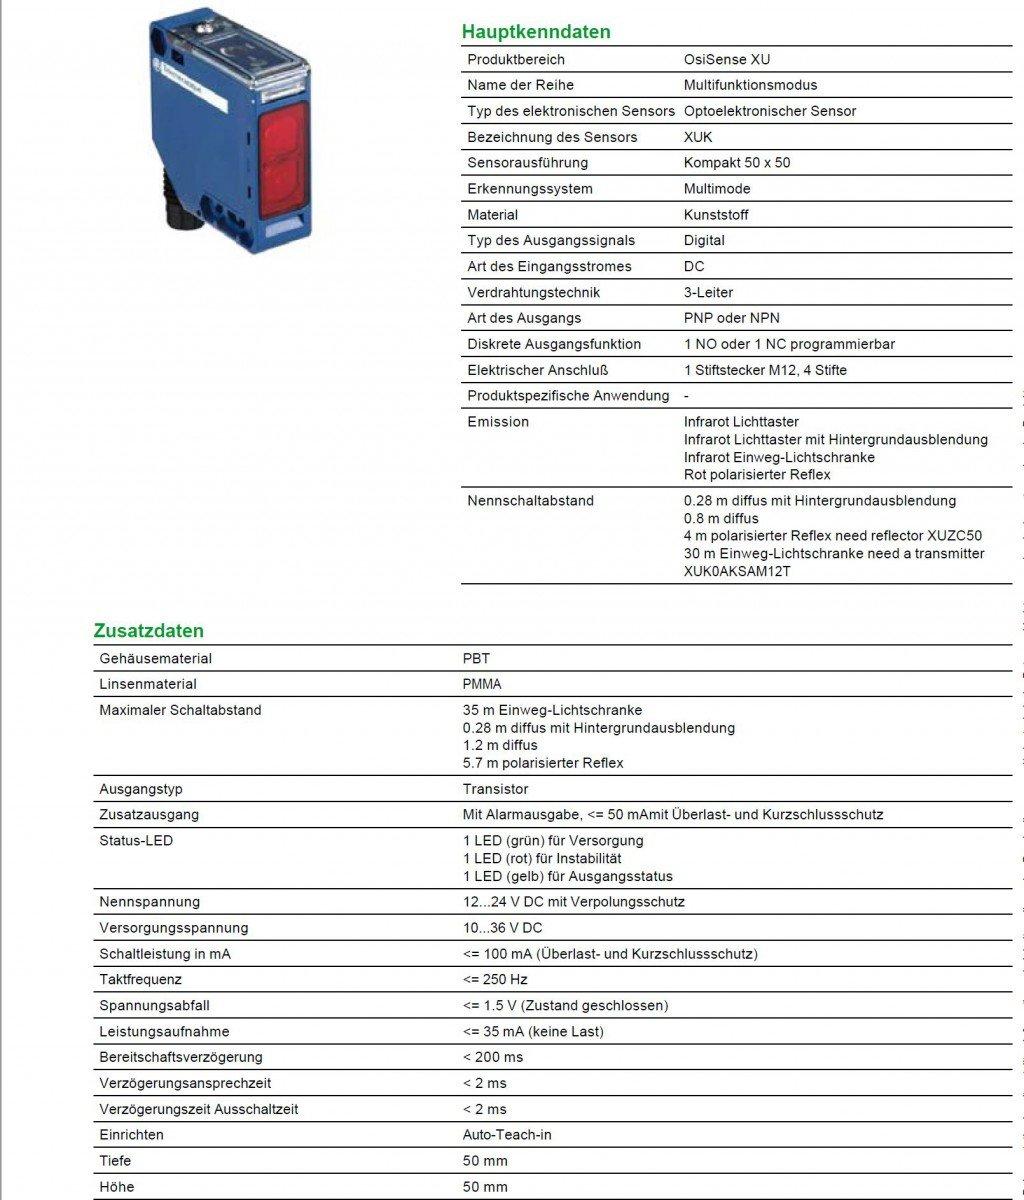 Schneider Electric XUK0AKSAM12 Sensor Fotoelétrico, Xuk, Multi, Sn 0-30 M, 12-24 Vcc, M12: Amazon.es: Industria, empresas y ciencia